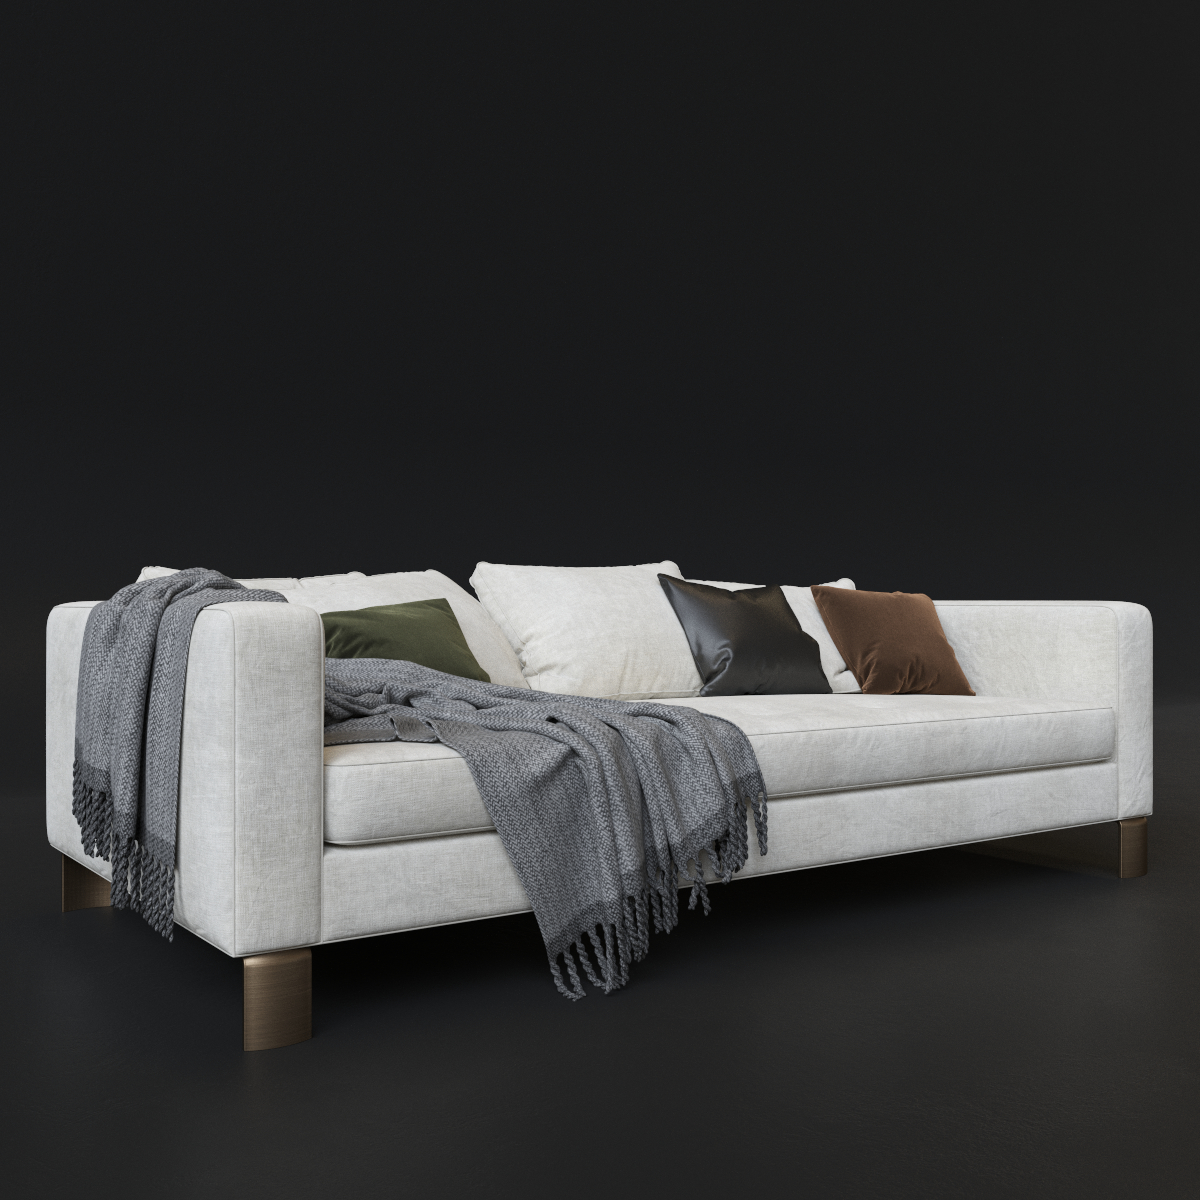 Prime Minotti Pollock White Sofa Caraccident5 Cool Chair Designs And Ideas Caraccident5Info